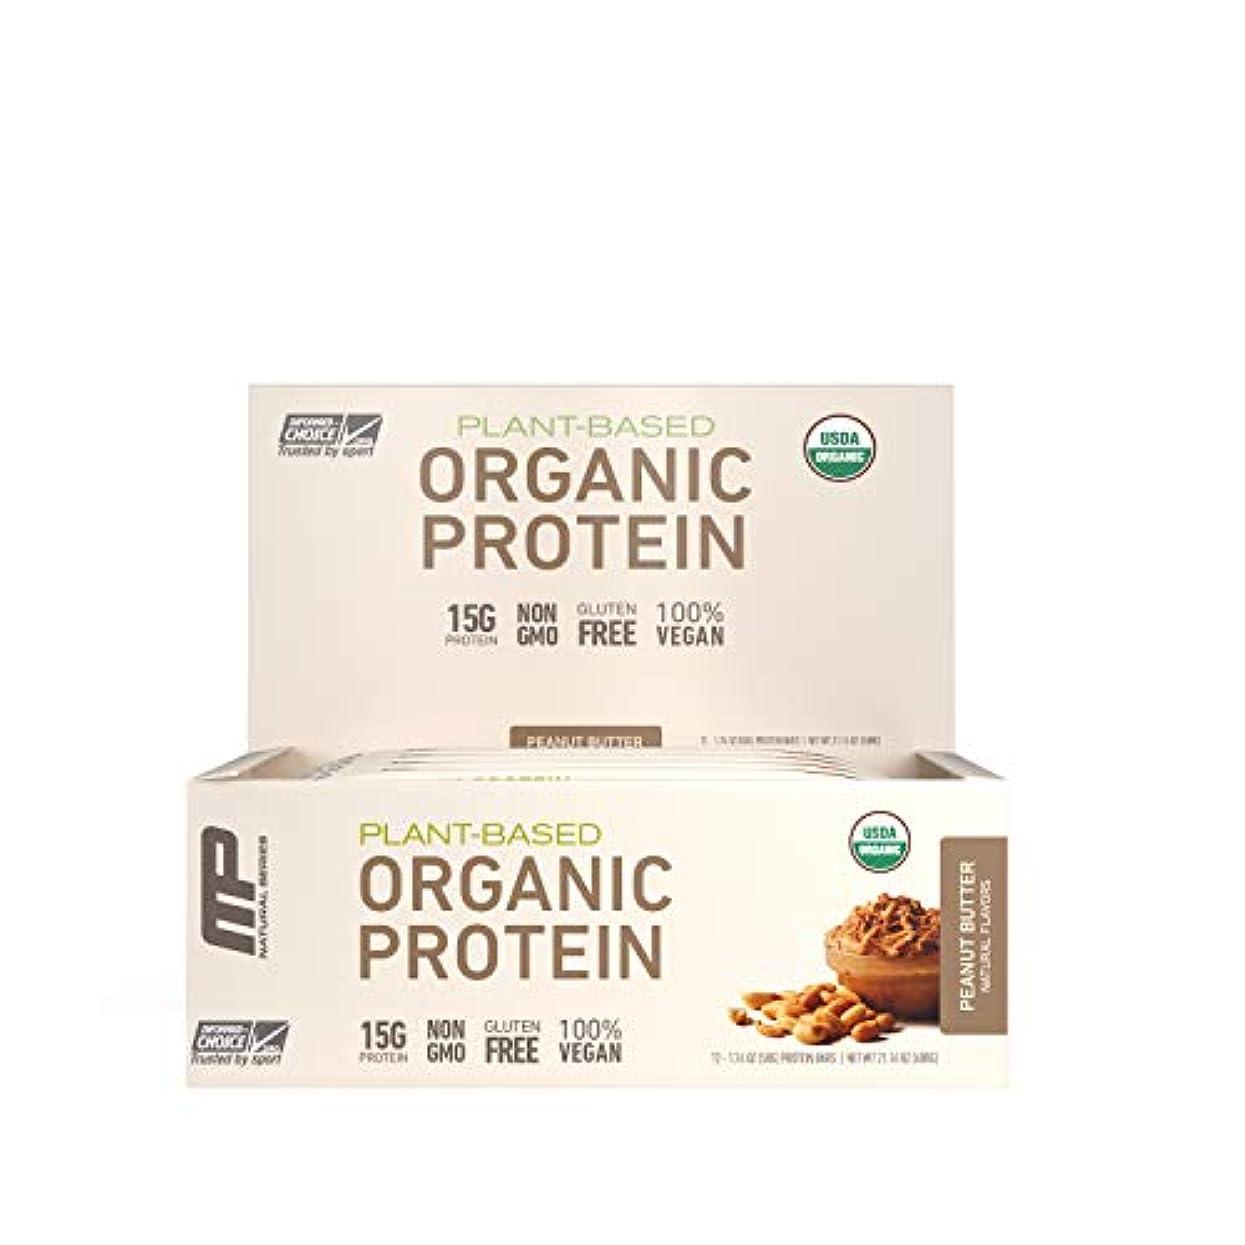 MusclePharm Natural オーガニック?プロテインバー(ピーナッツバター味12本) (600 g) 海外直送品